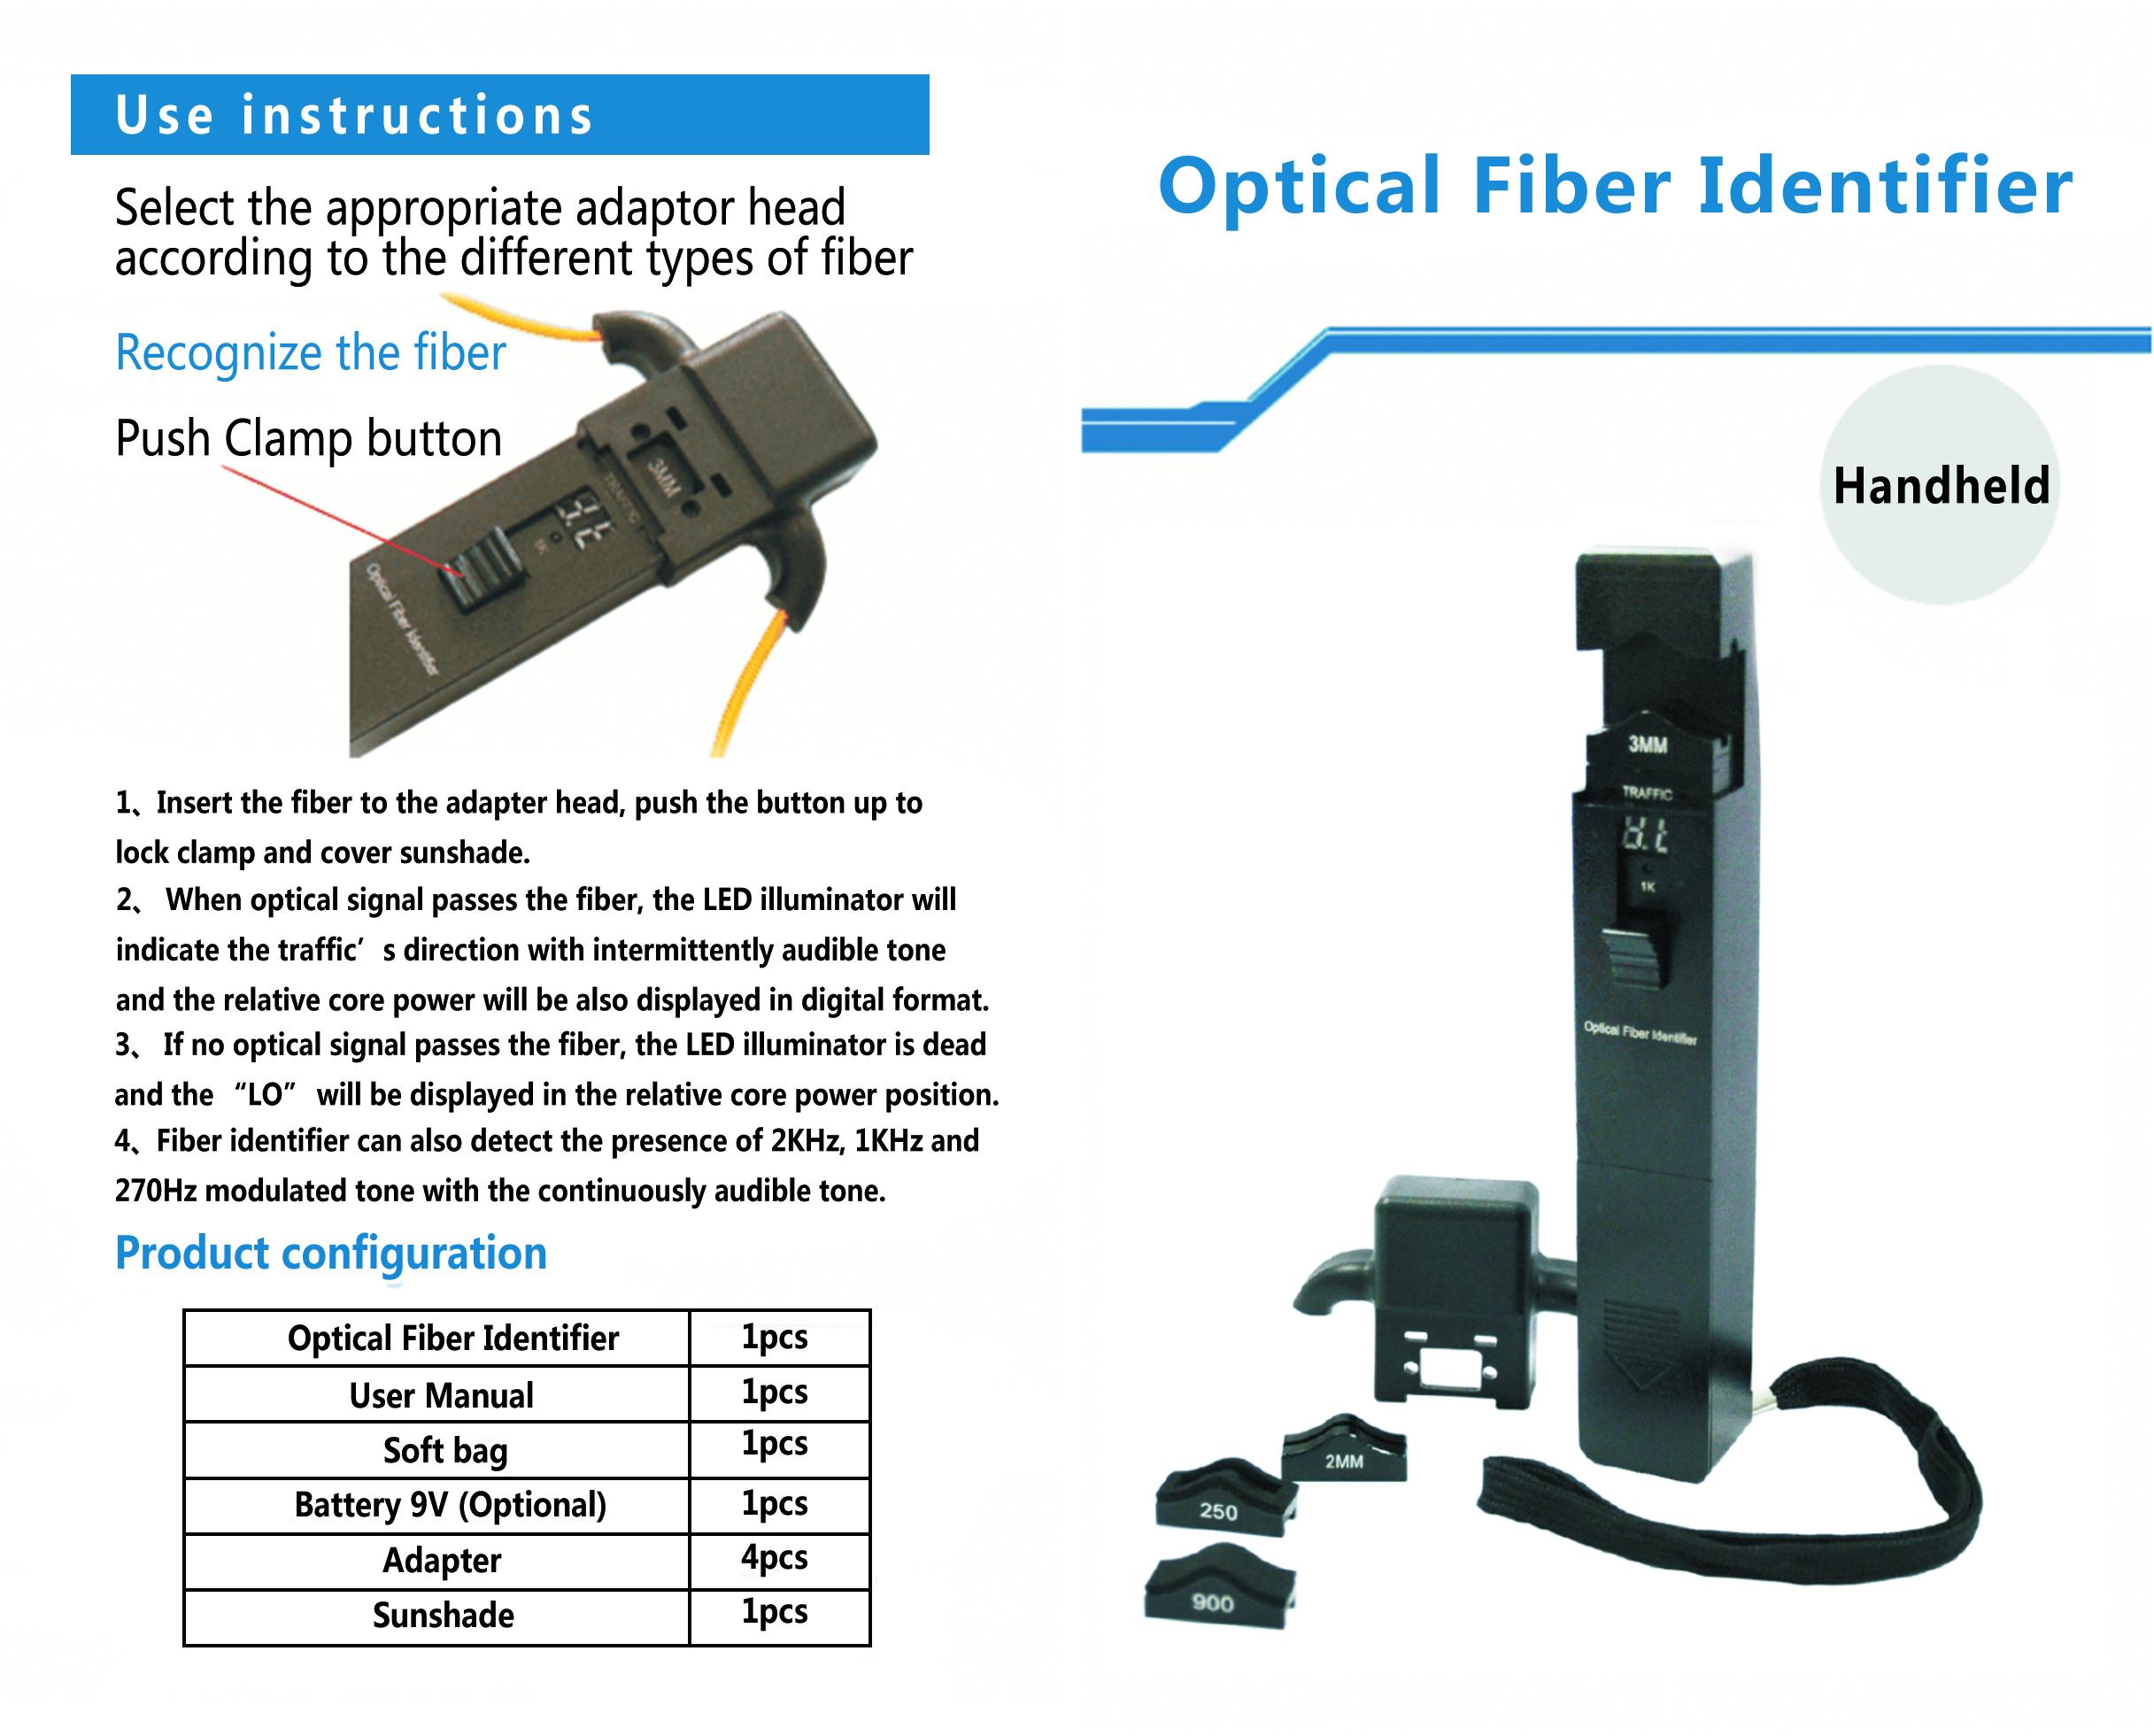 comptyco Optical Fiber Identifier Liver Fiber Detector in Mental Case